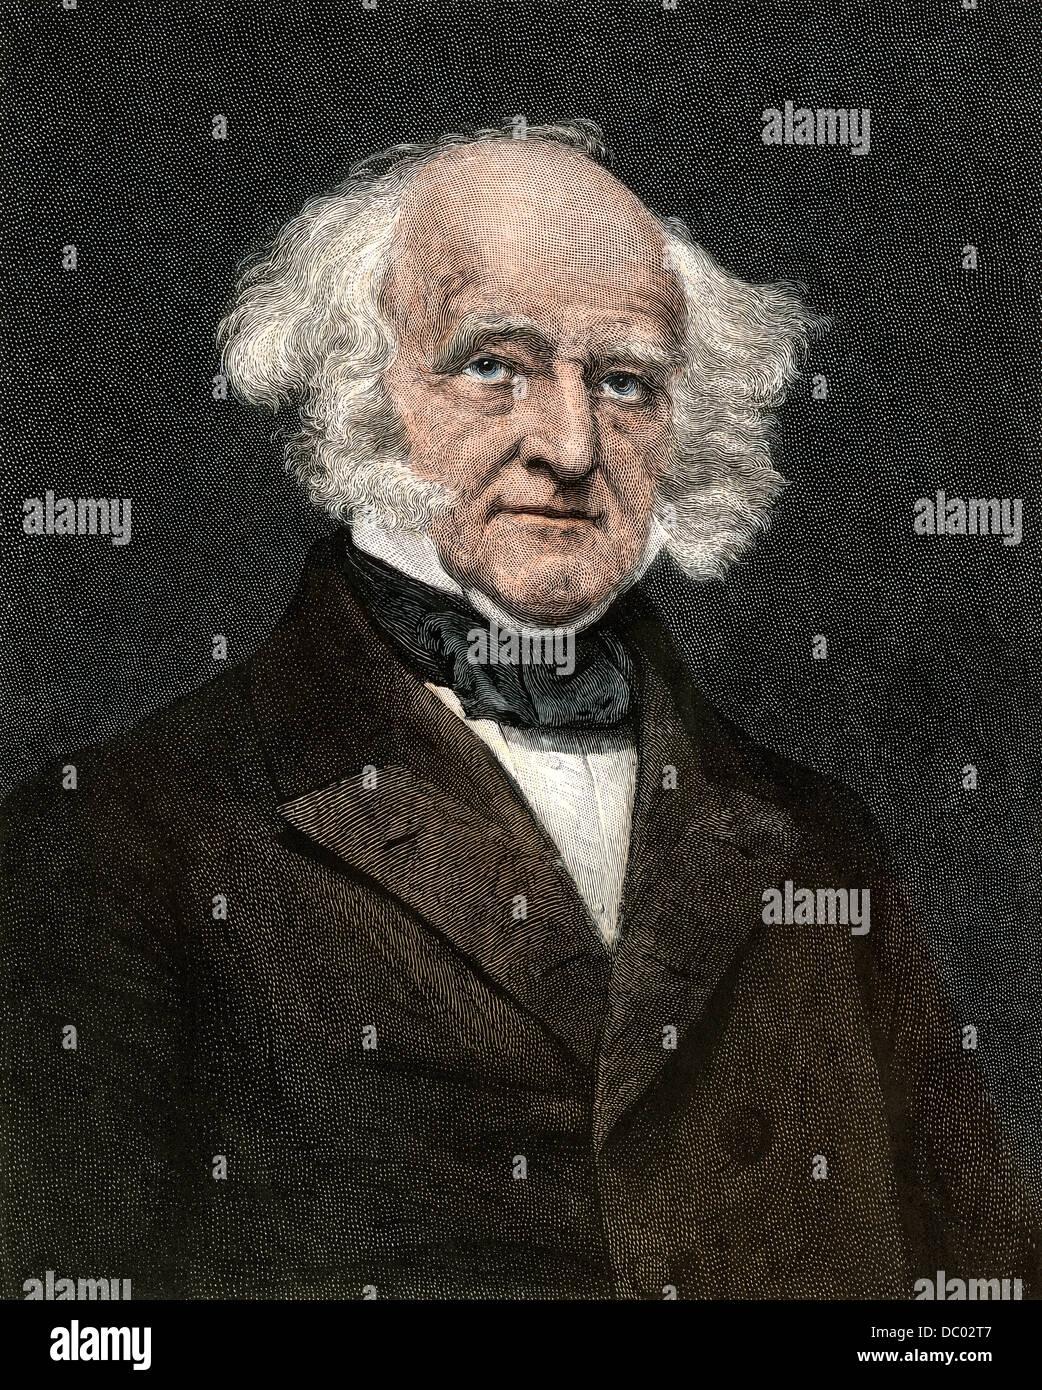 US President Martin Van Buren. Hand-colored engraving - Stock Image